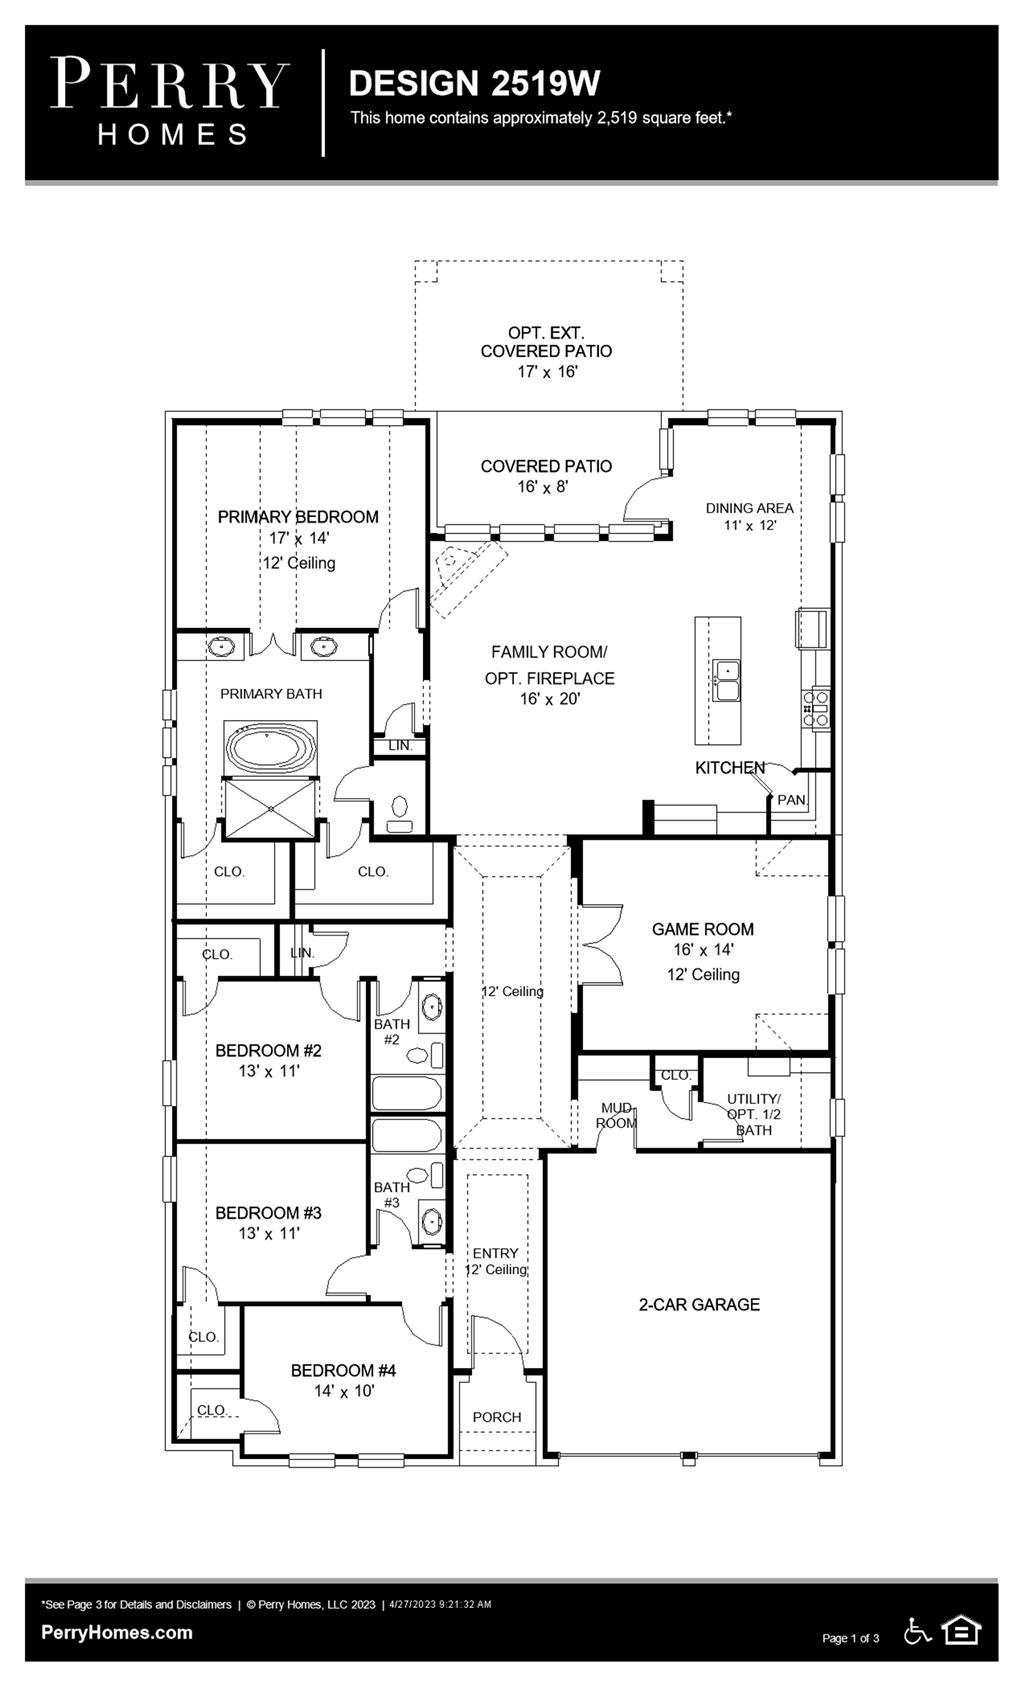 Floor Plan for 2519W